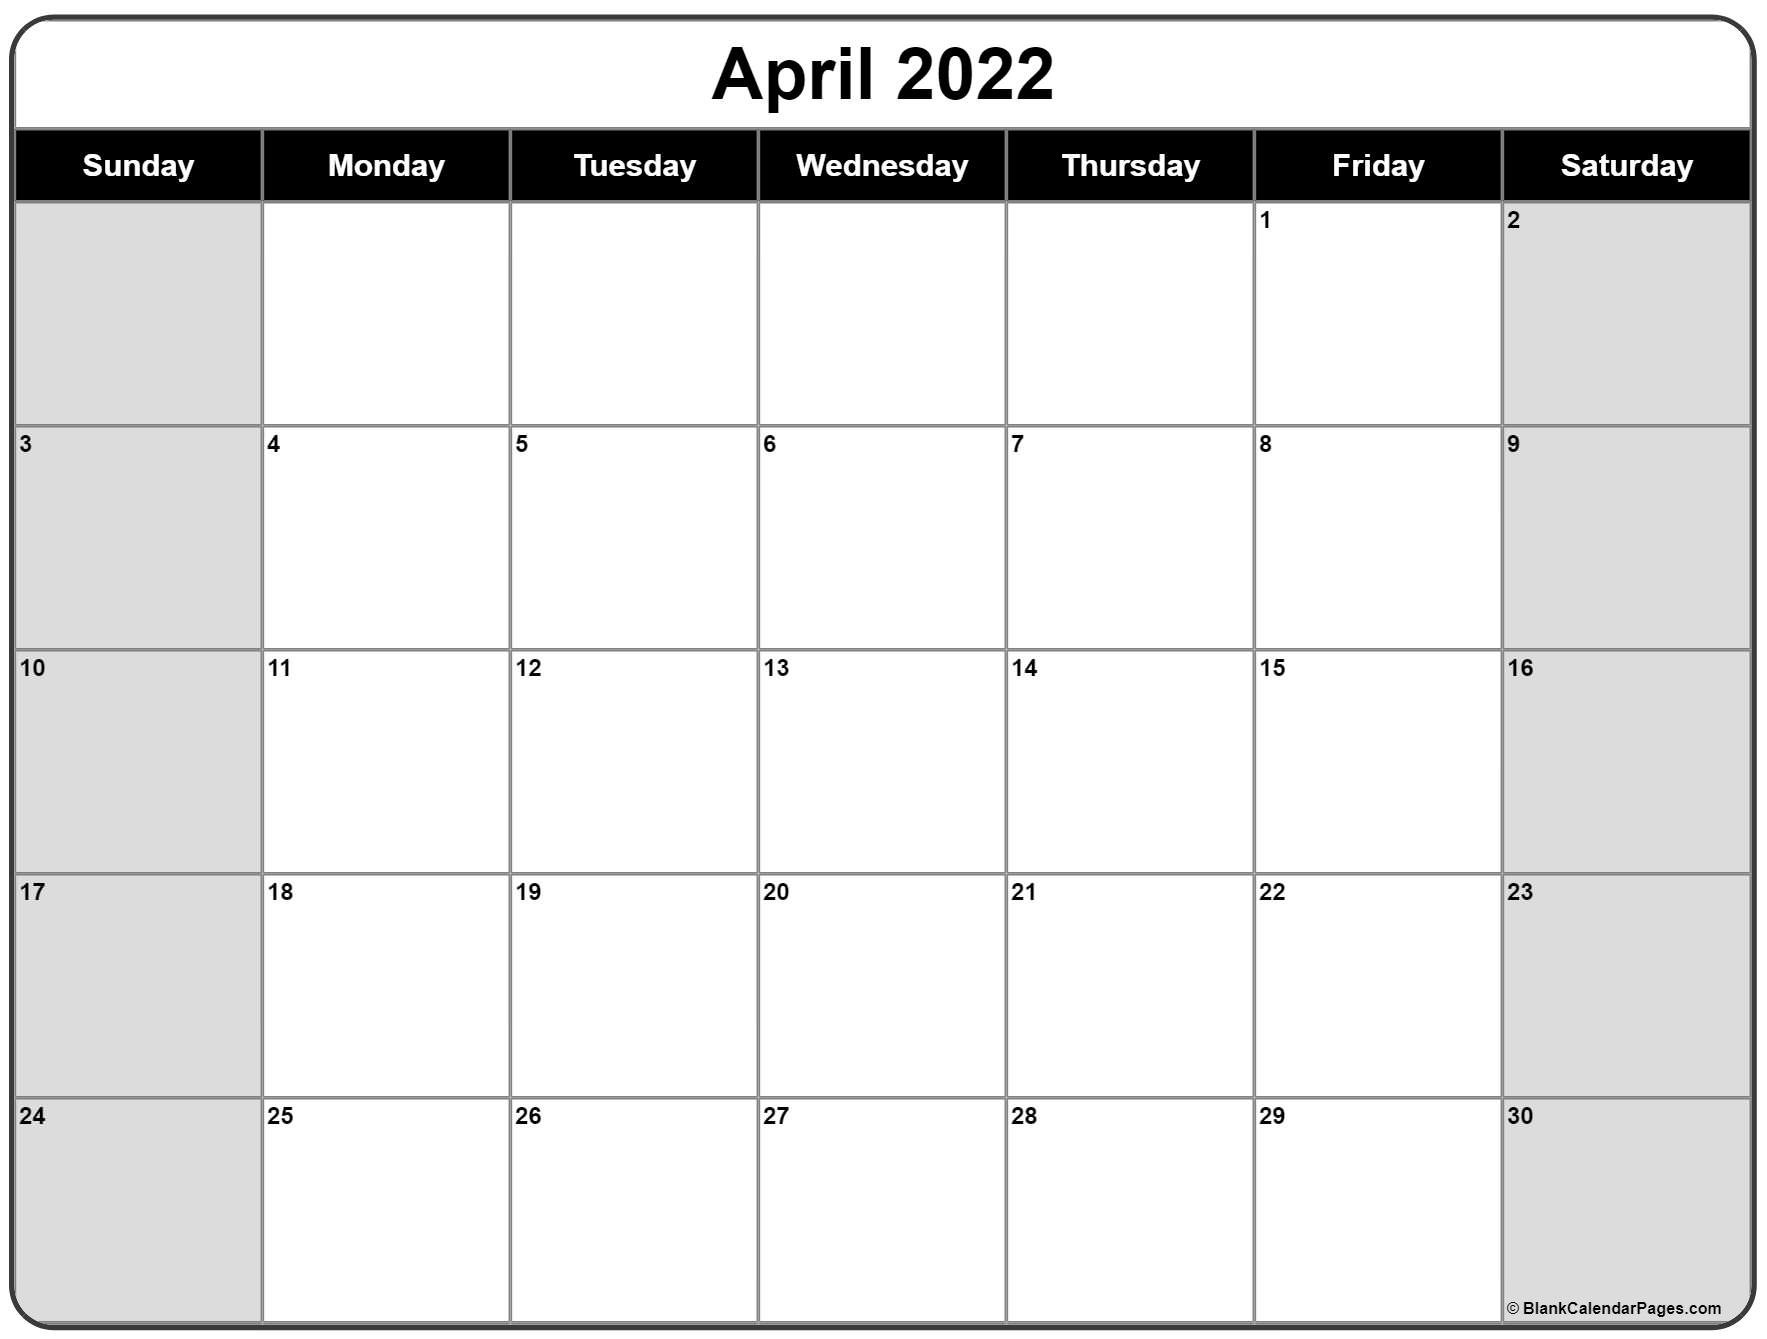 April 2022 Calendar | Free Printable Calendar Templates intended for April 2022 Printable Calendar Free Photo